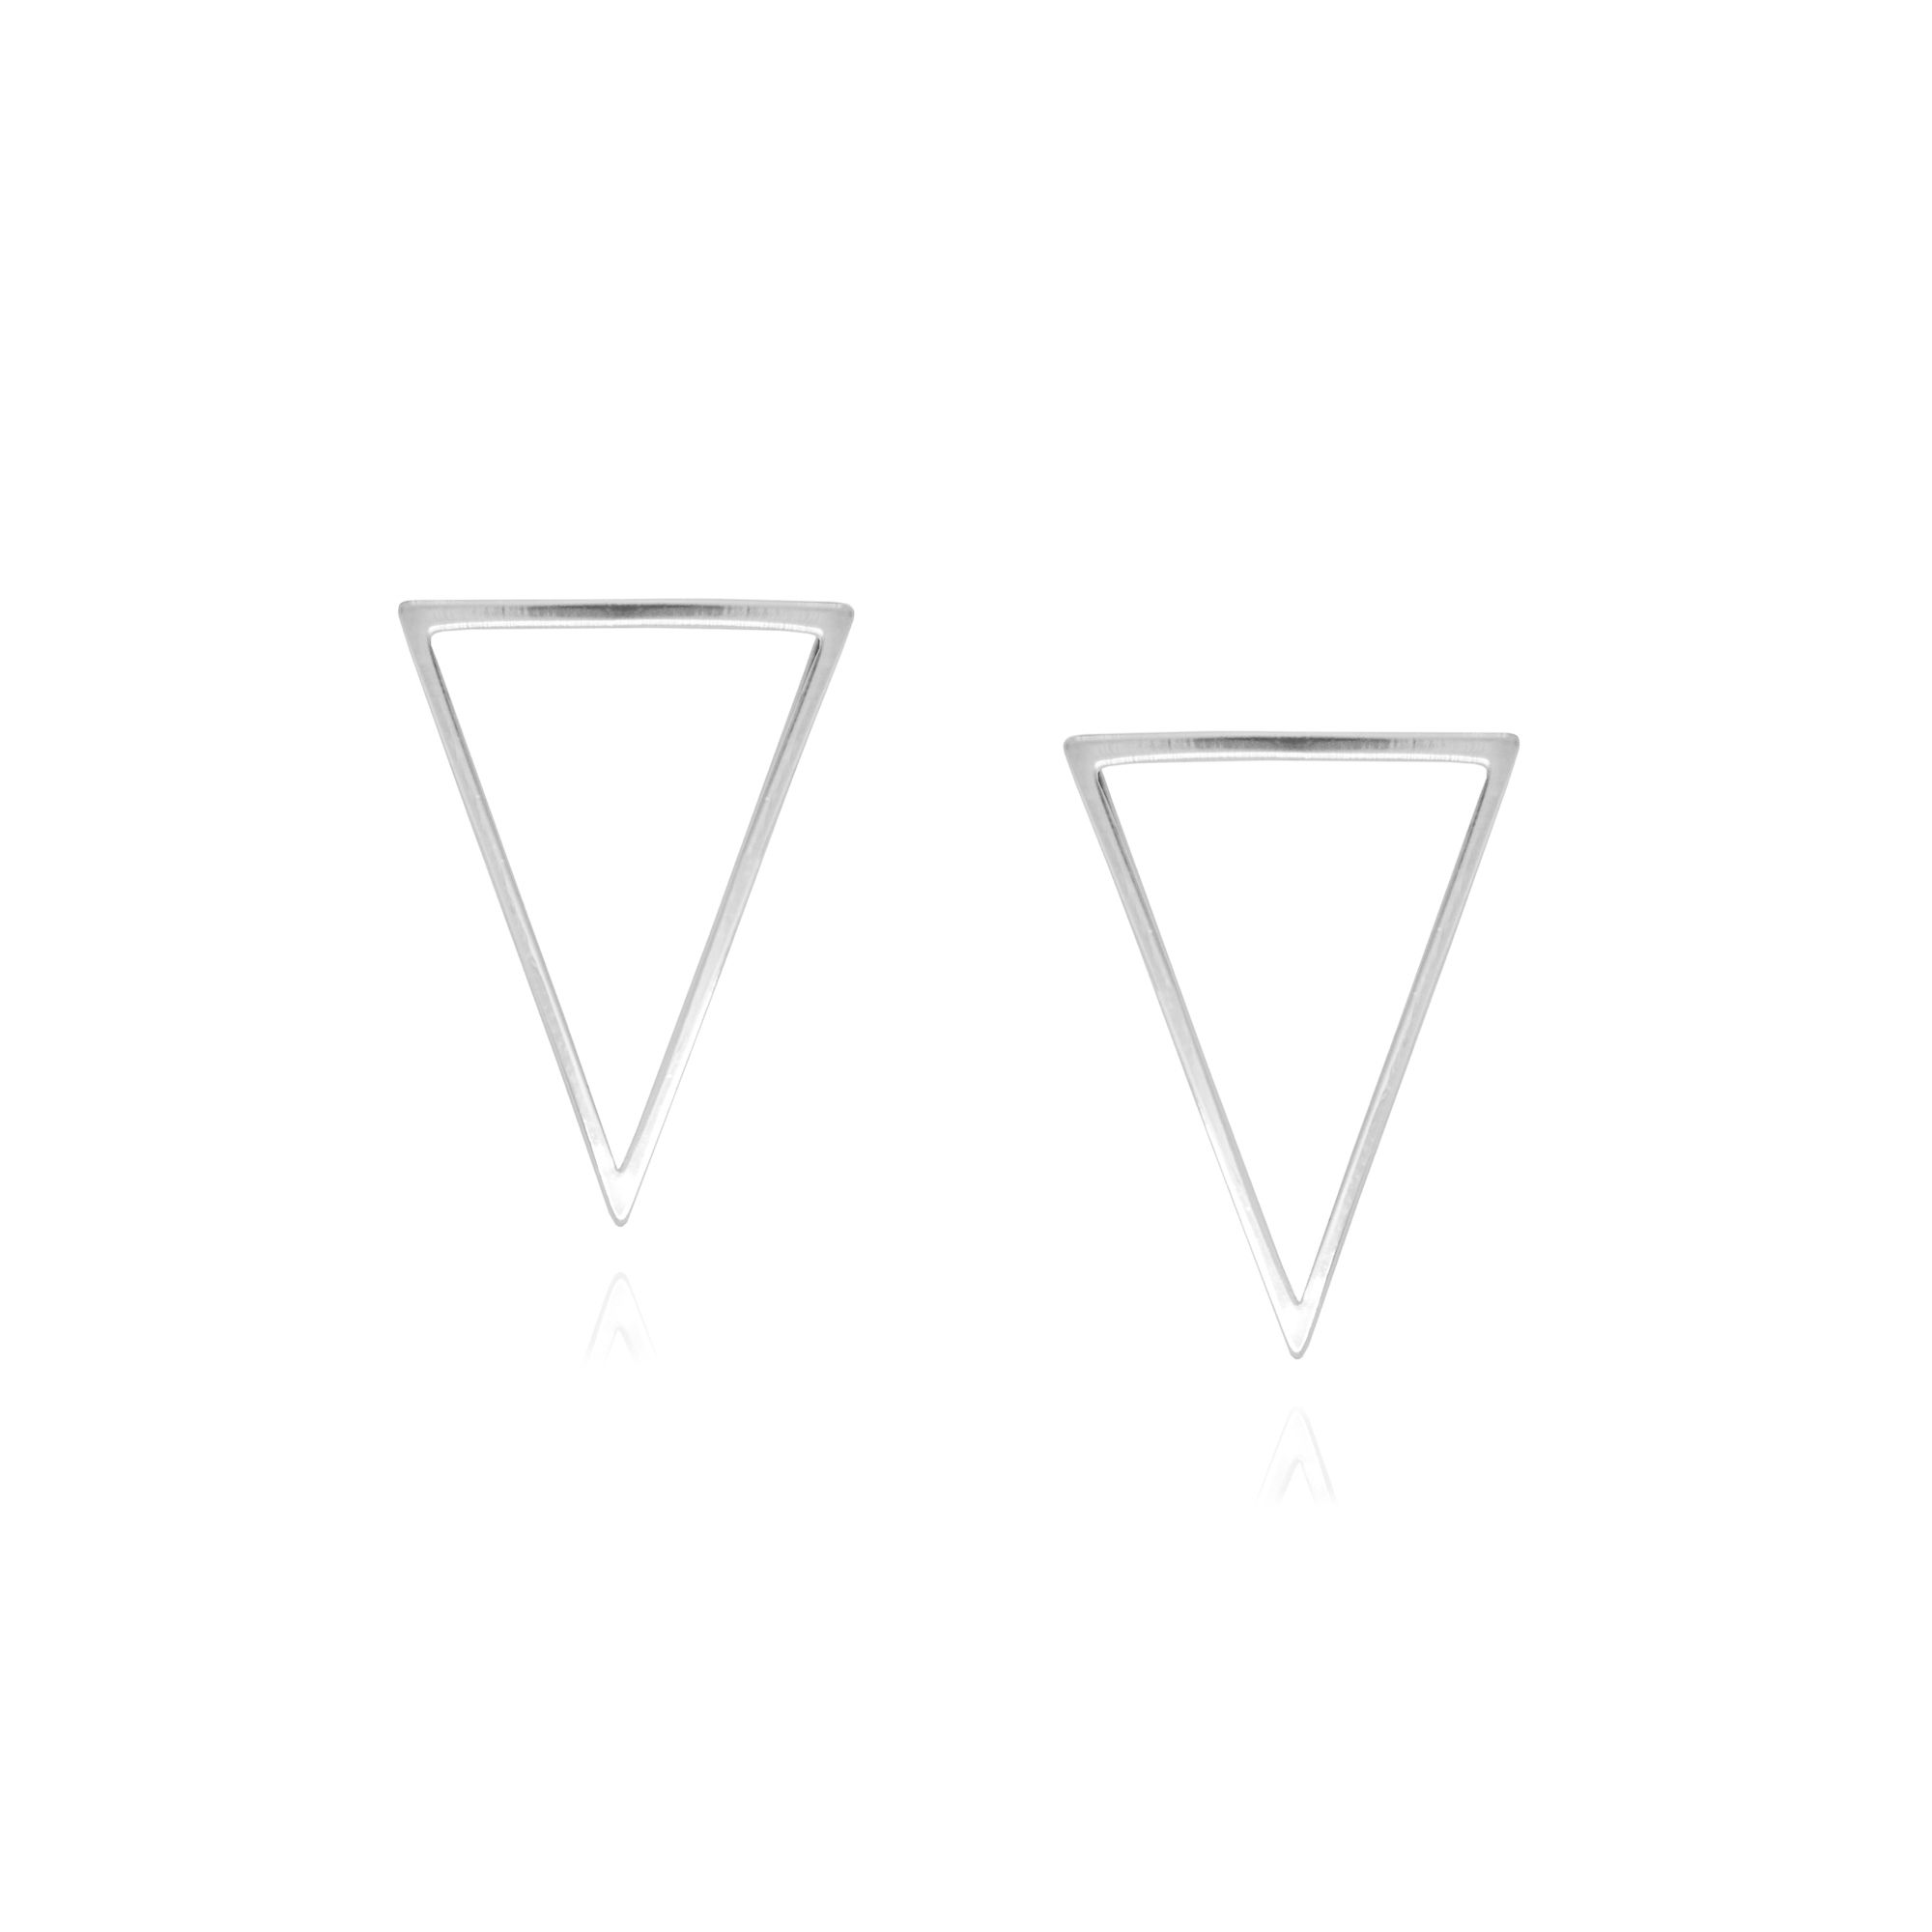 Brinco Semi joia triângulo vazado P estilo minimalista folheado a ouro 18k ou rhodium